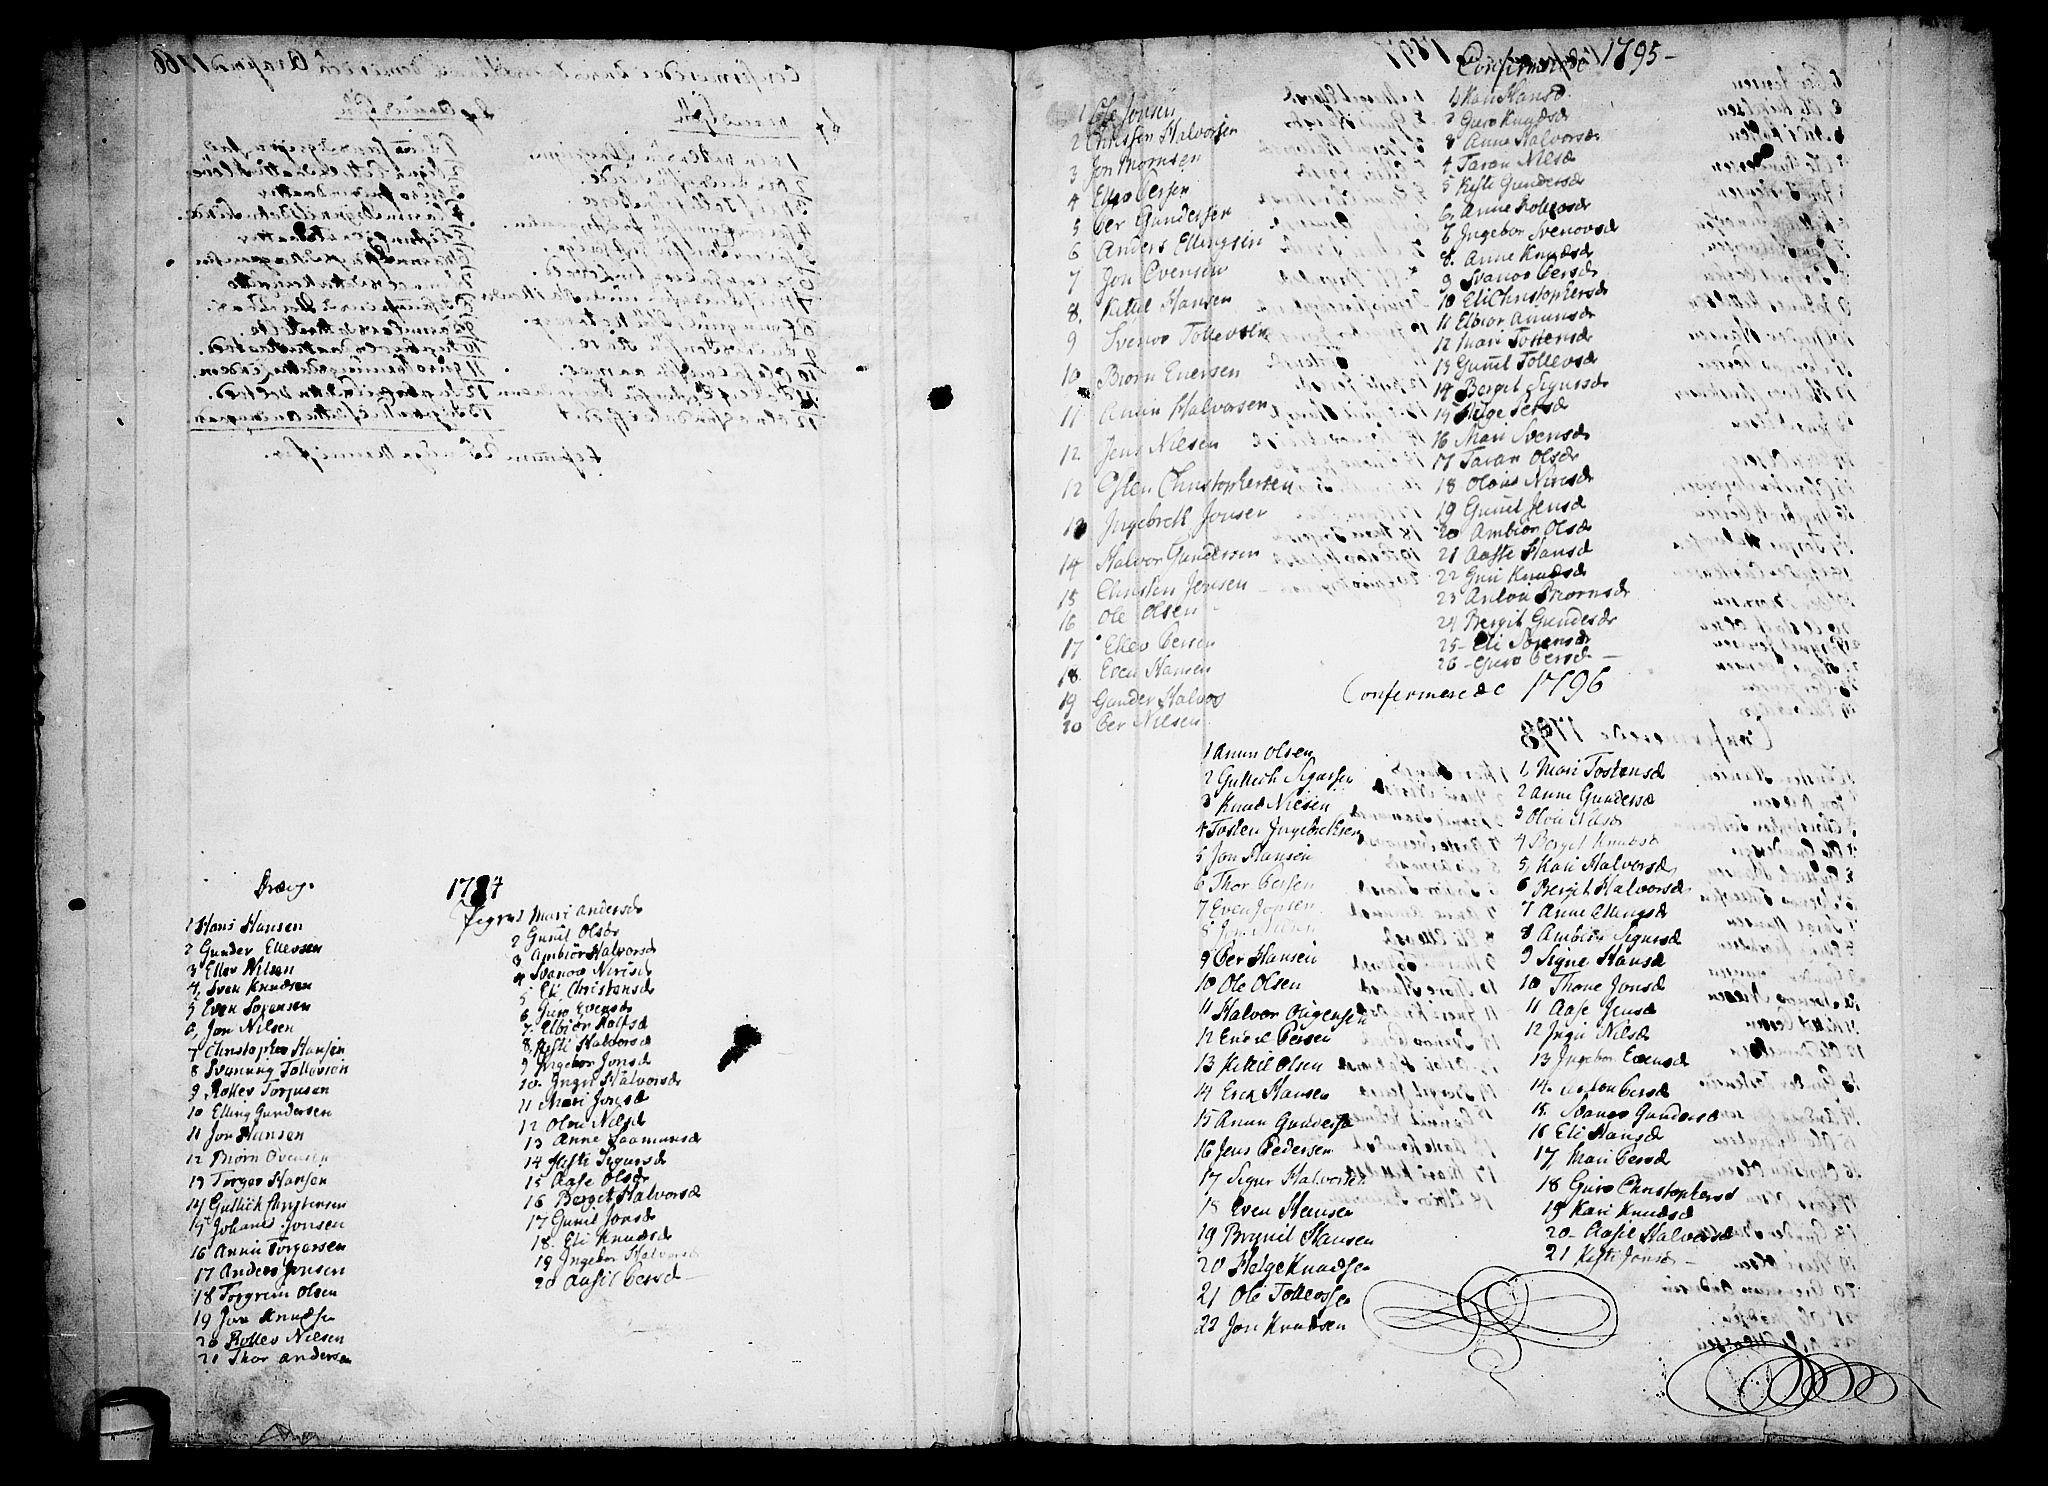 SAKO, Sauherad kirkebøker, F/Fa/L0003: Ministerialbok nr. I 3, 1722-1766, s. 164-165